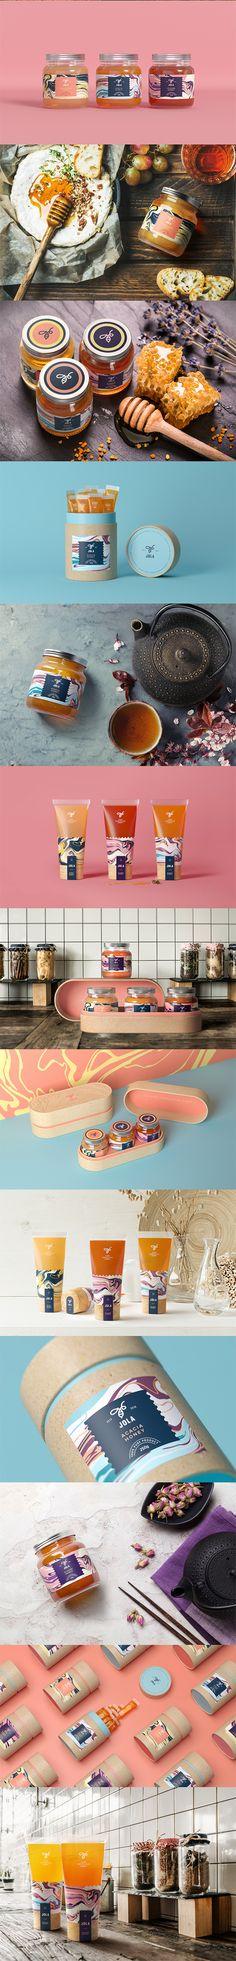 Bottle packaging design - Jola Honey Mix